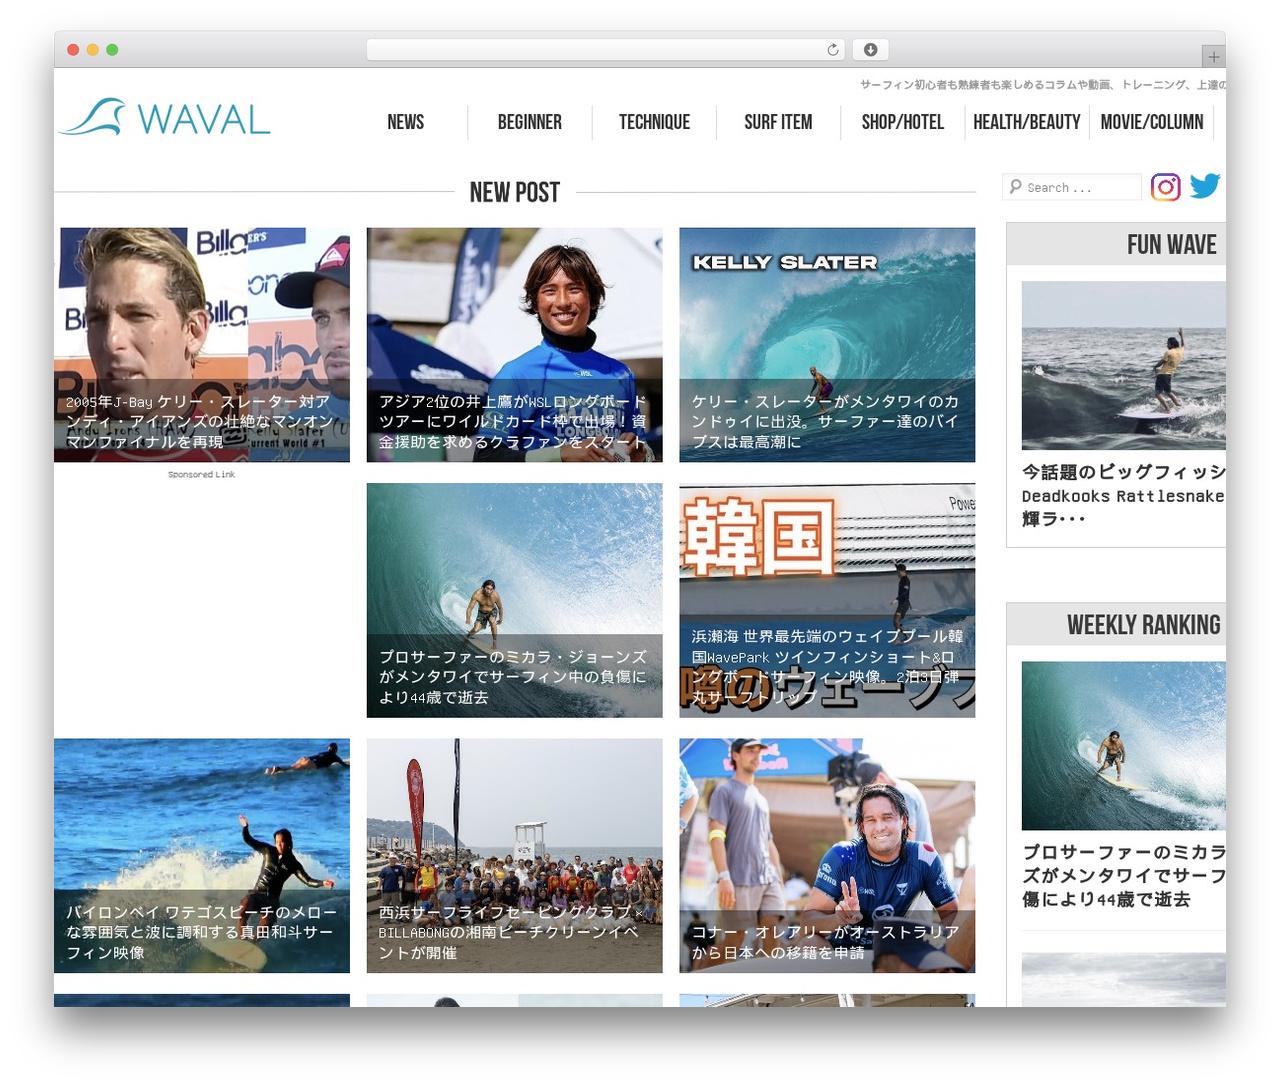 waval_var4 WordPress website template - waval.net